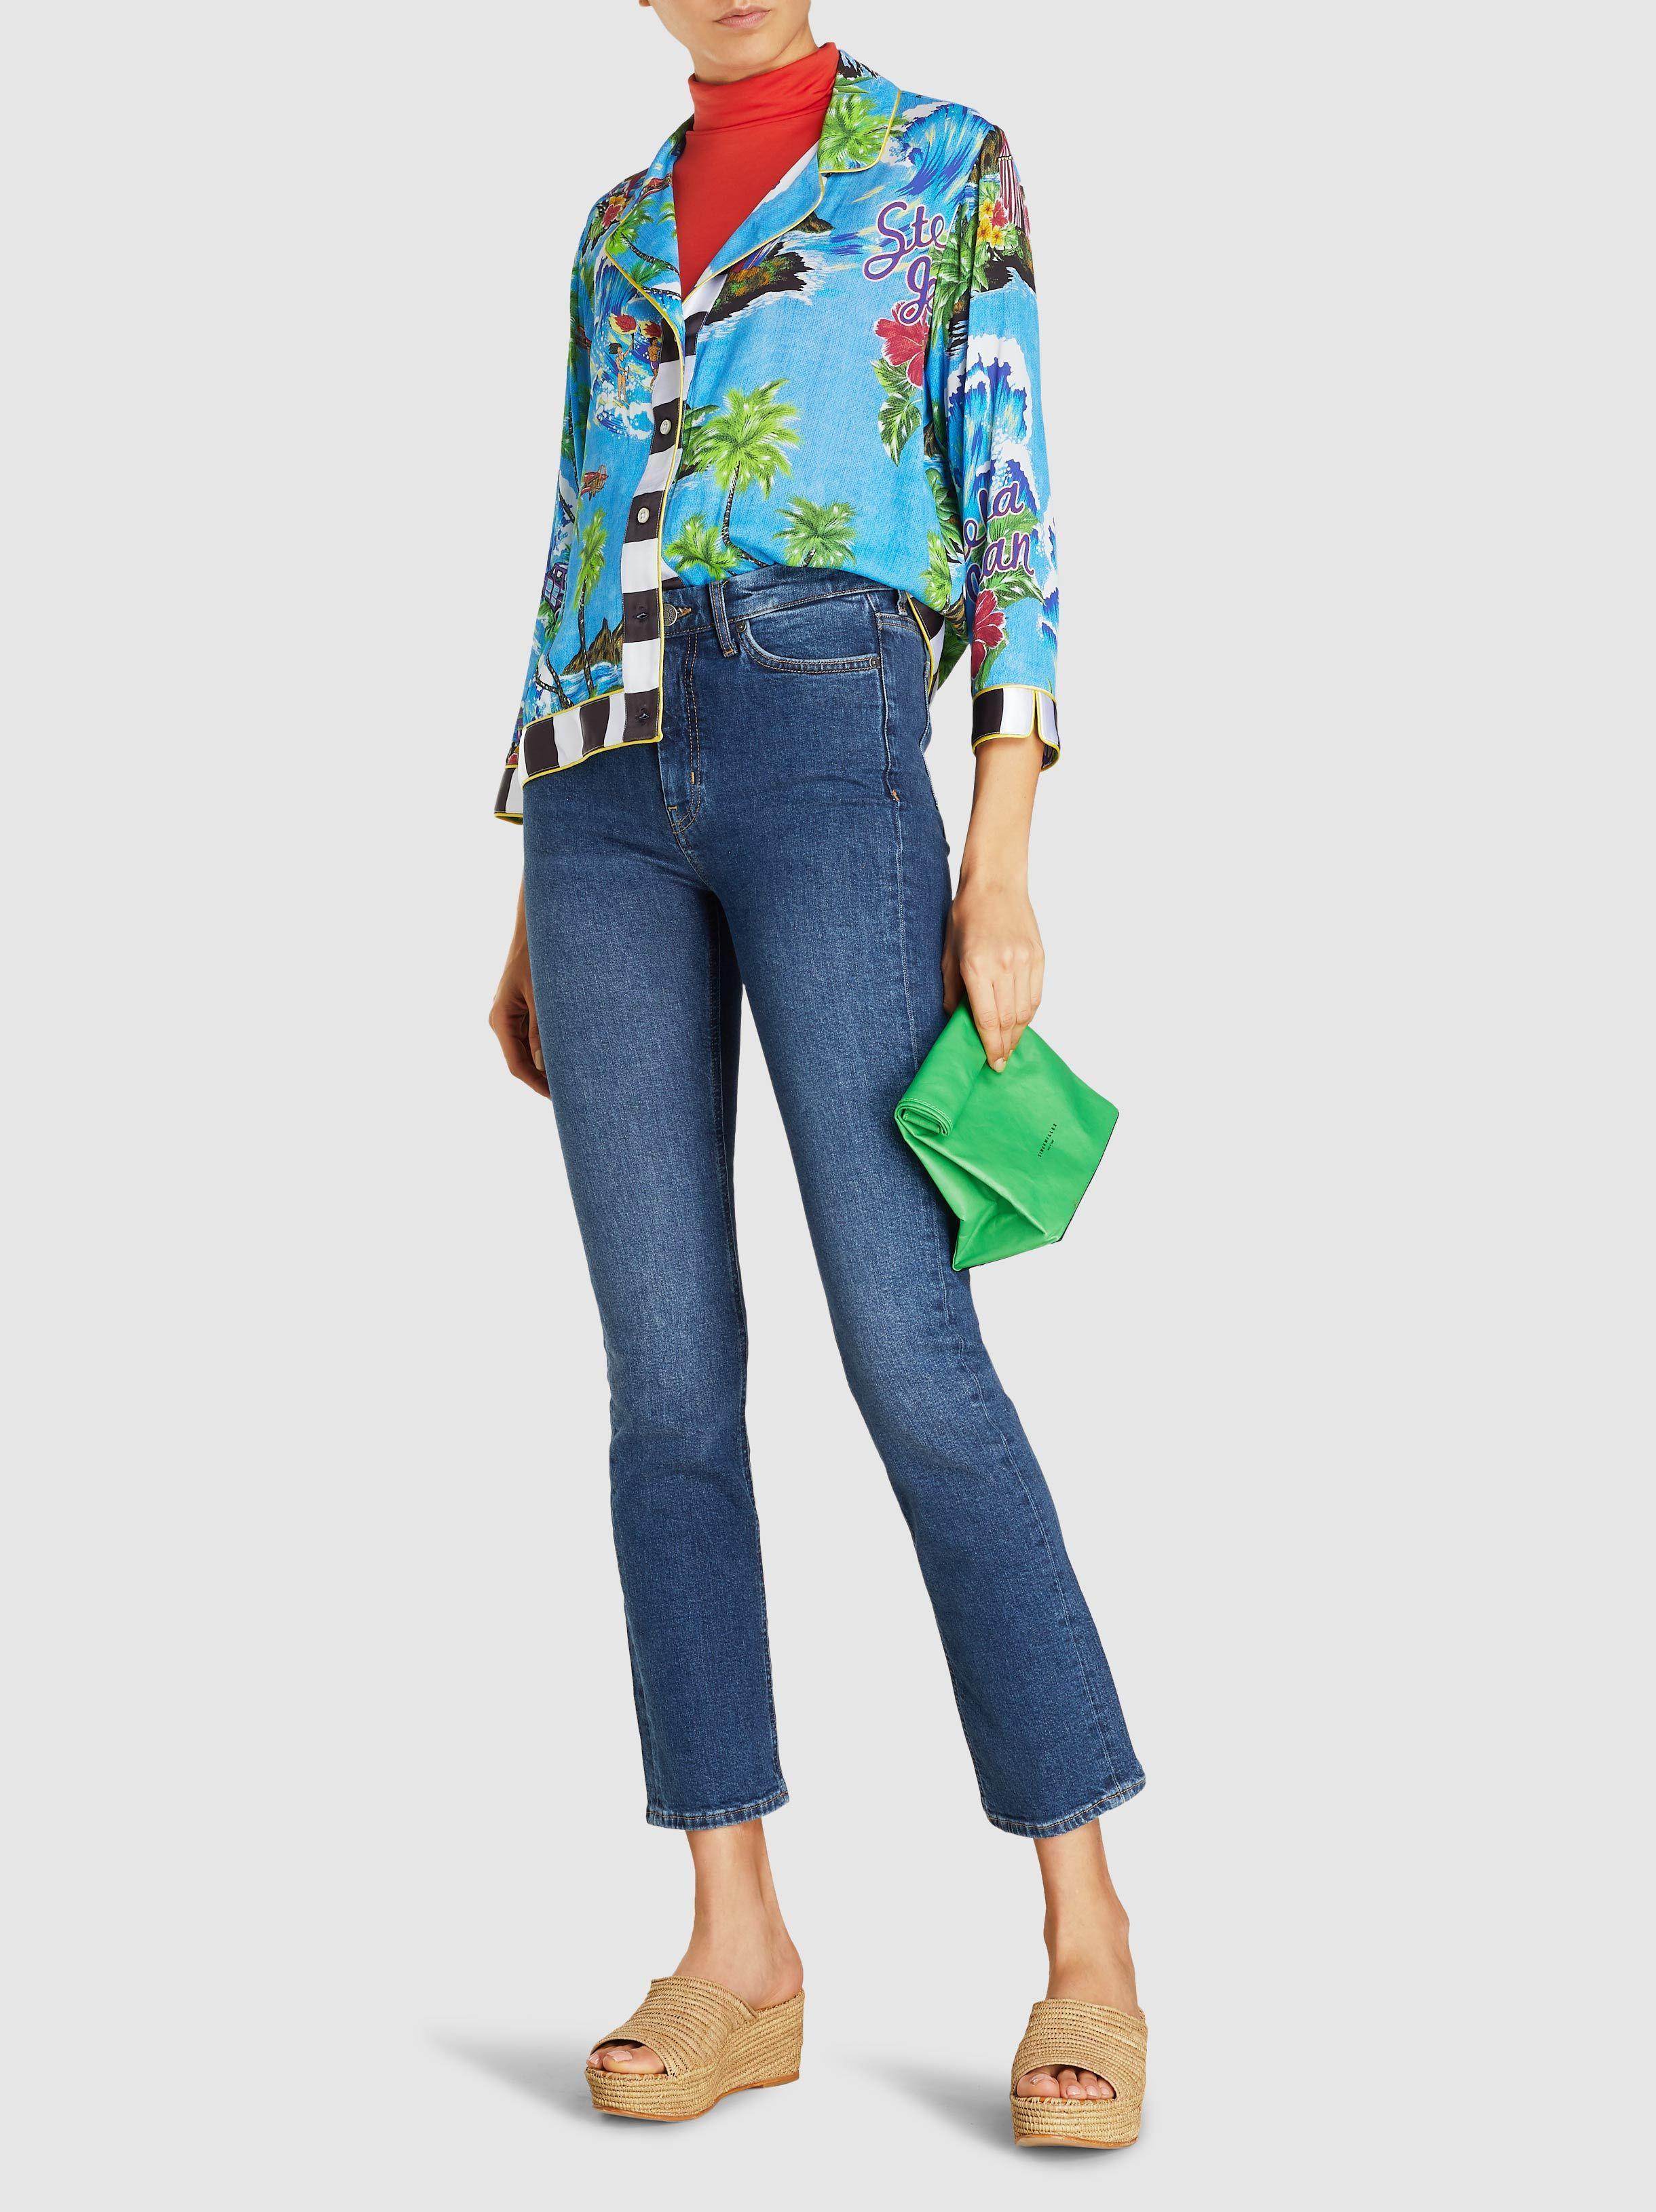 6e474700 Stella Jean - Blue Hawaiian Print Cropped Button-up Organic Cotton Bowling  Shirt - Lyst. View fullscreen